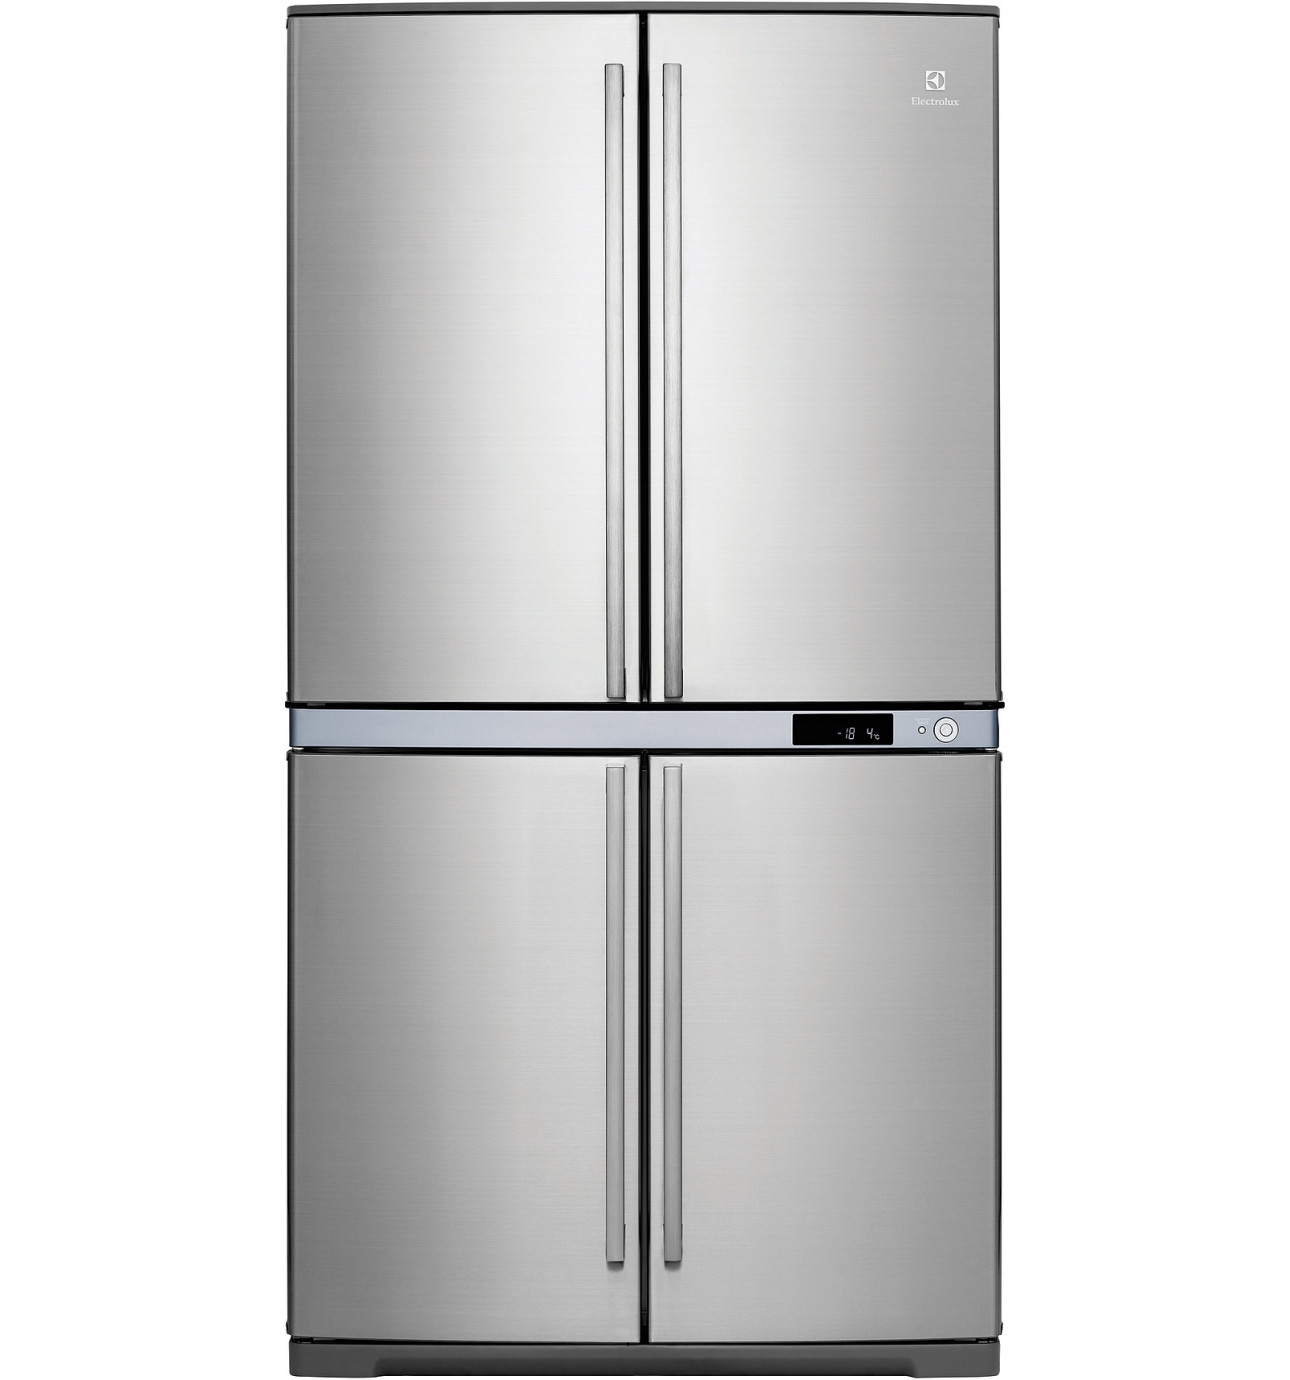 eqe6207sd 620l 4 door fridge